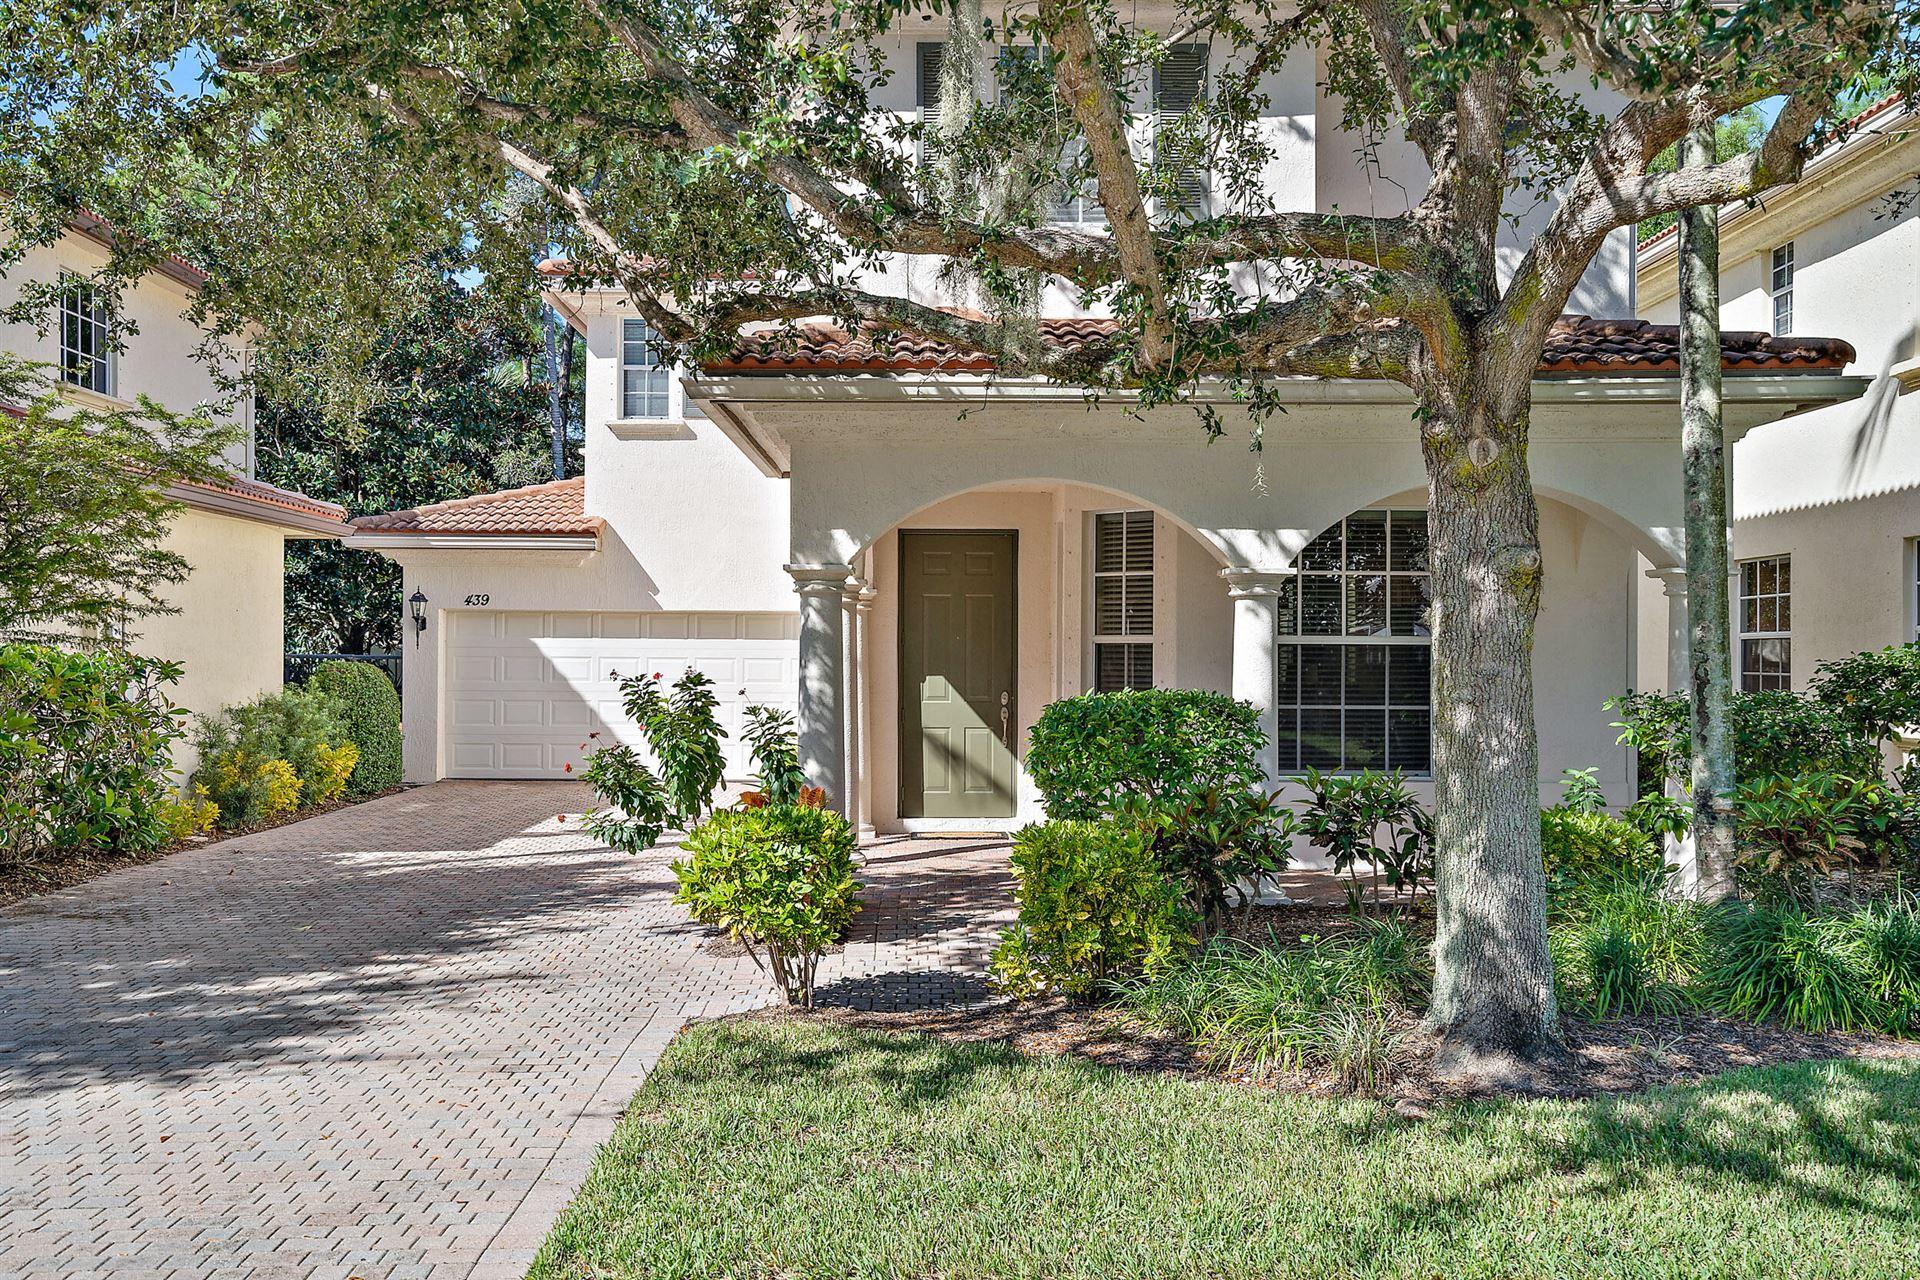 Photo of 439 Pumpkin Drive, Palm Beach Gardens, FL 33410 (MLS # RX-10728530)